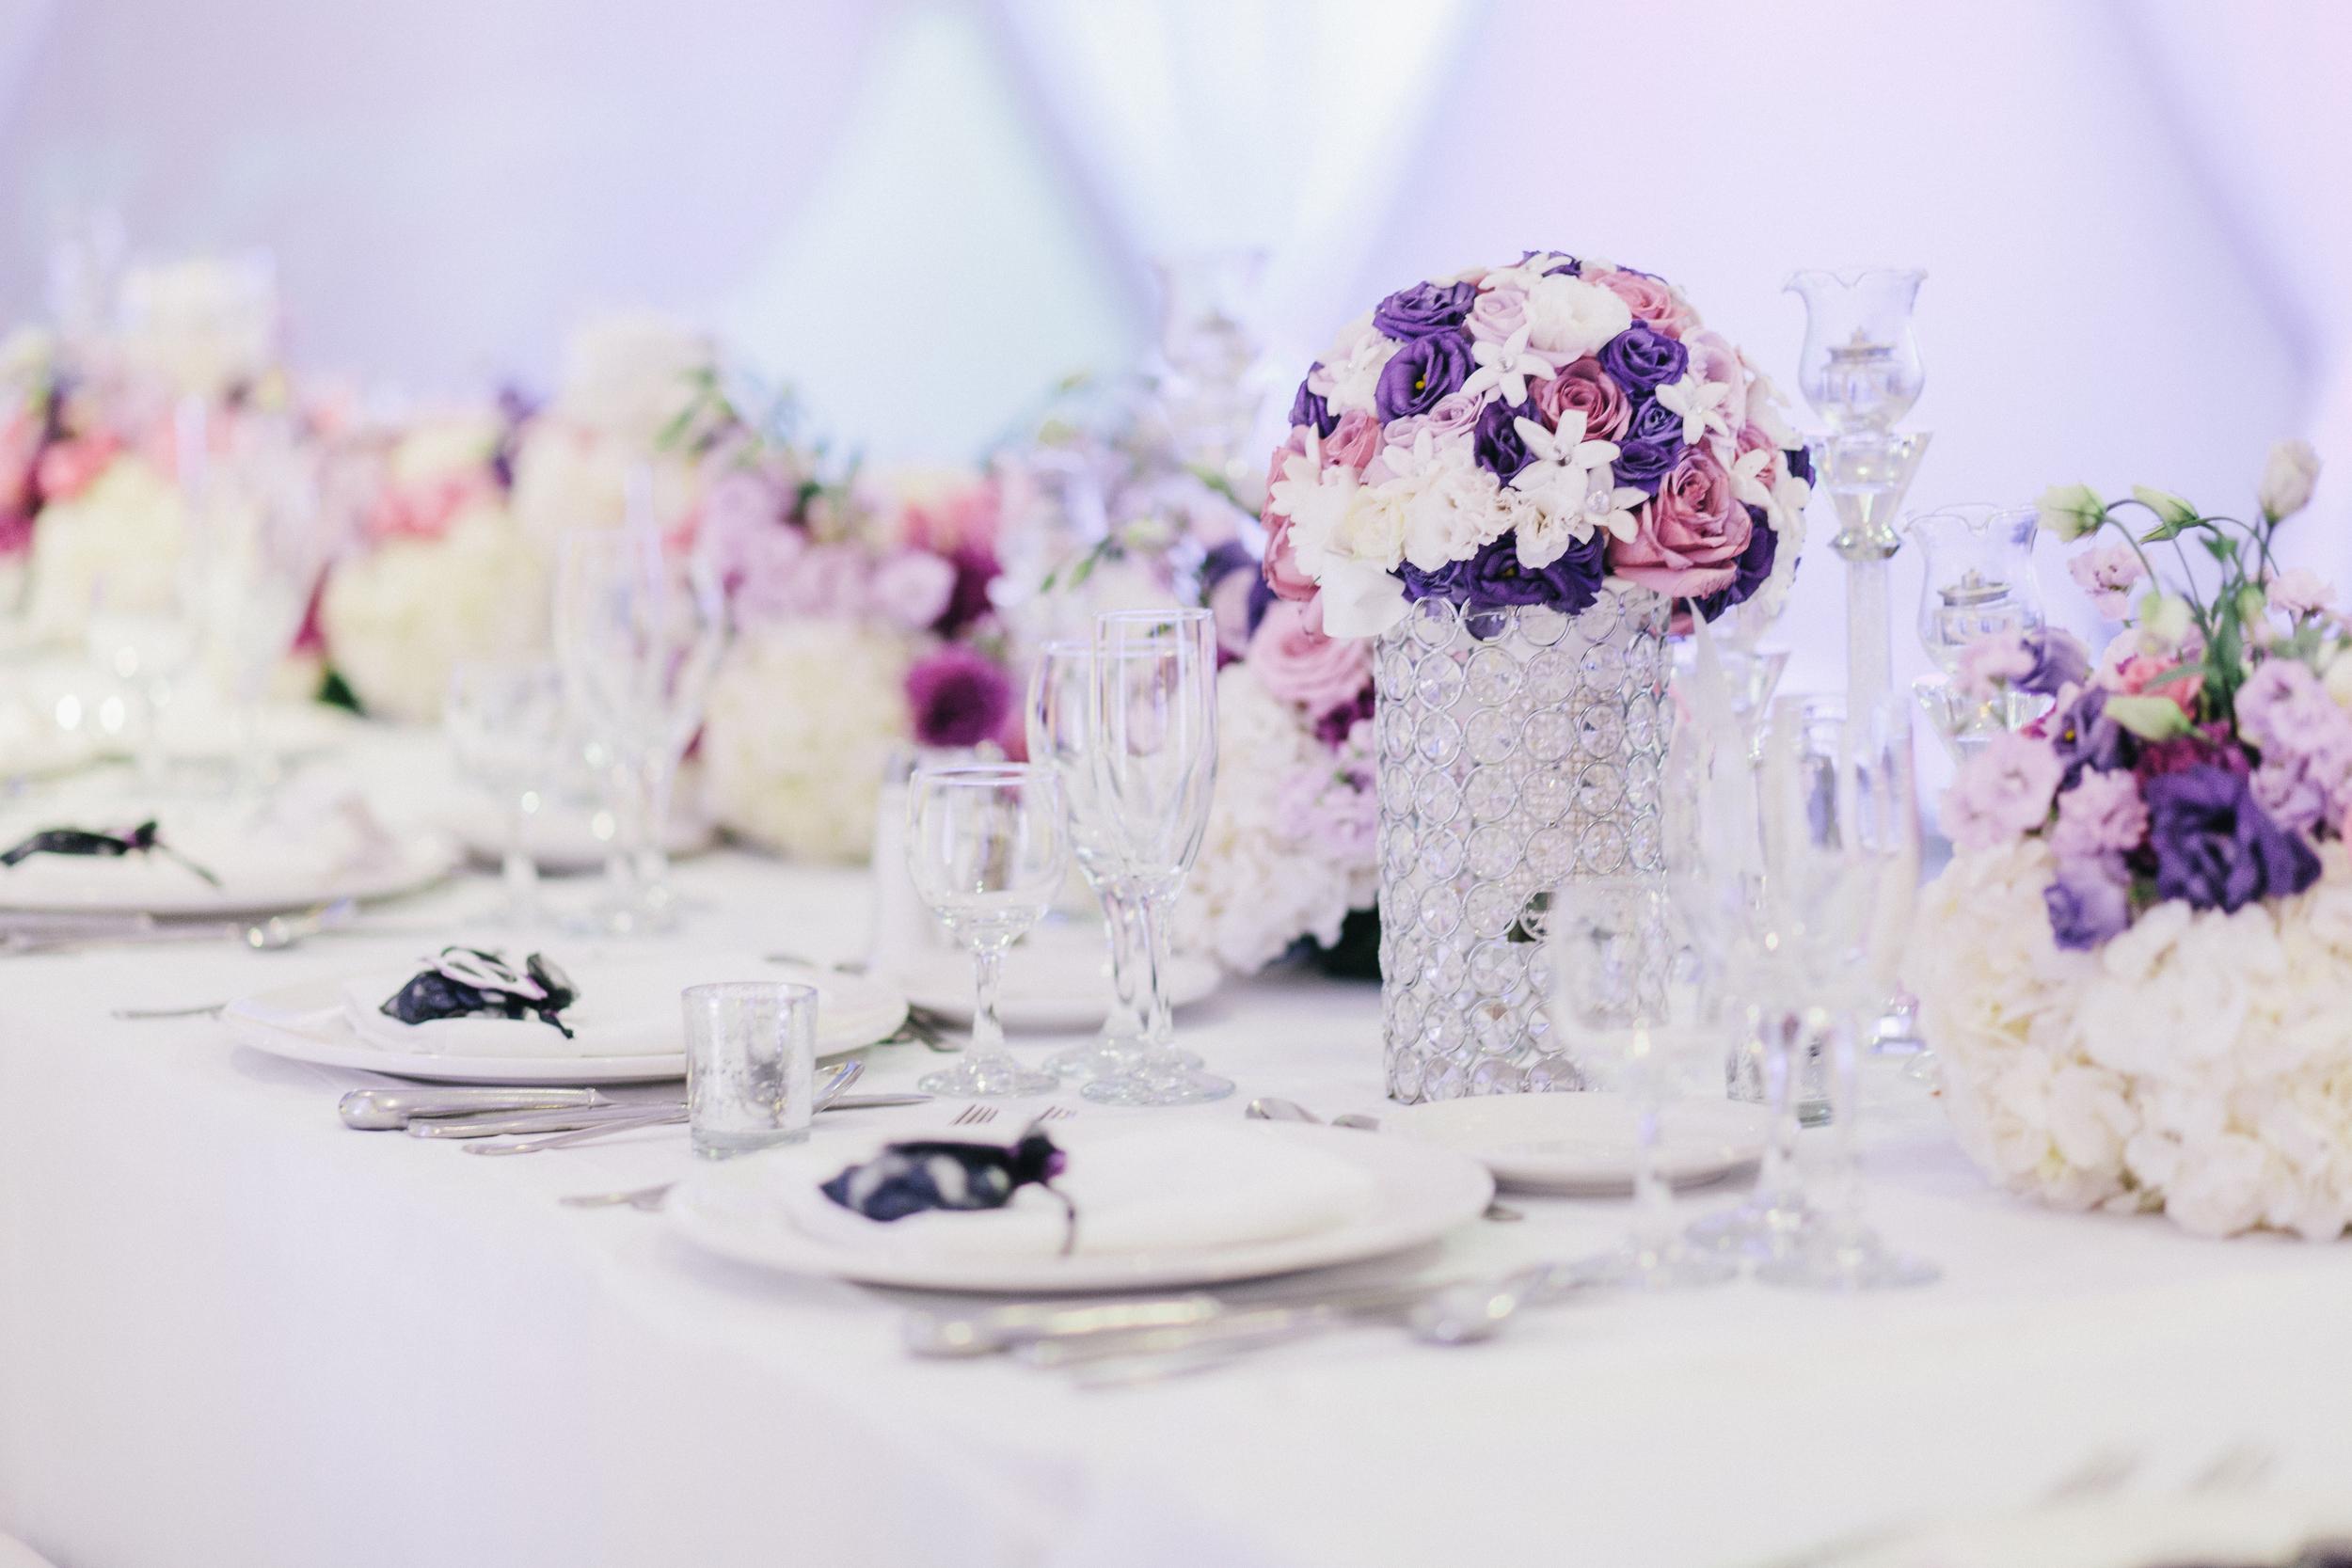 Stephanie-Kyle-paradise-banquet-hall-michael-rousseau-photography-best-toronto-wedding-photographer-documentary-wedding036.JPG